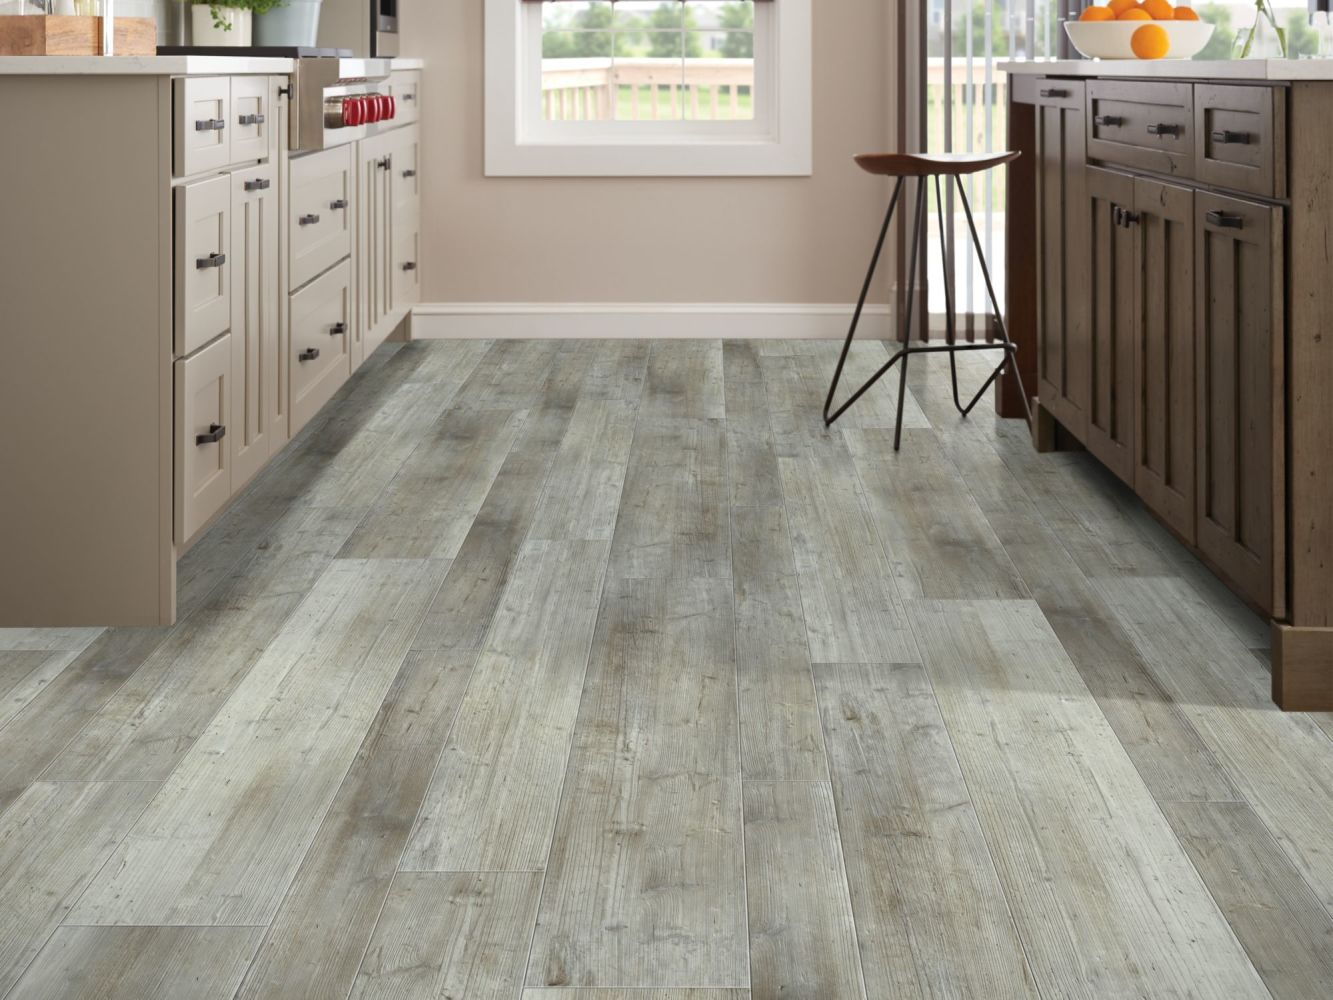 Shaw Floors Resilient Residential Grandmaraismixplus Distinct Pine 05039_506GA